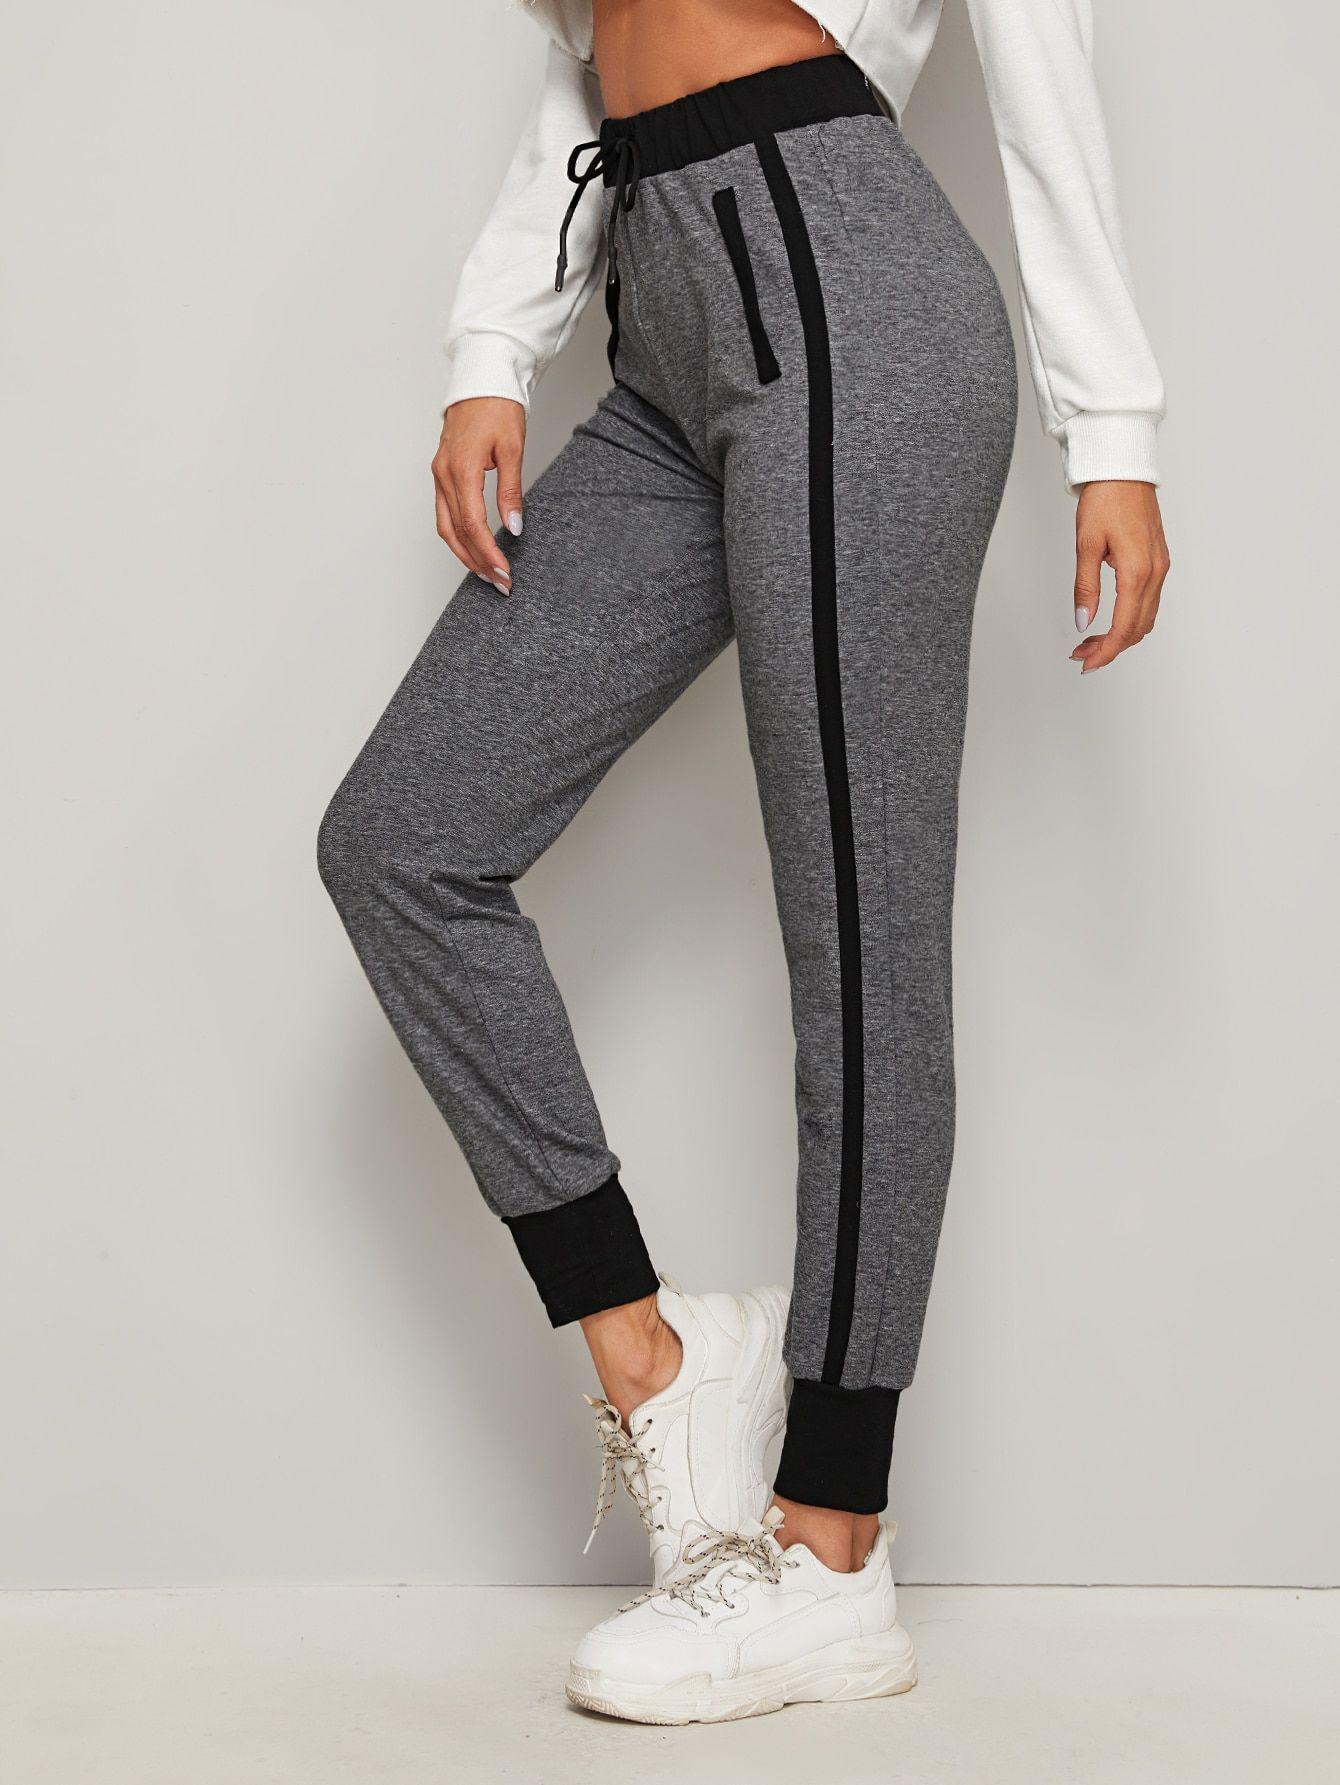 Contrast Trim Heather Grey Sweatpants #Sponsored , #Sponsored, #Trim#Contrast#Heather